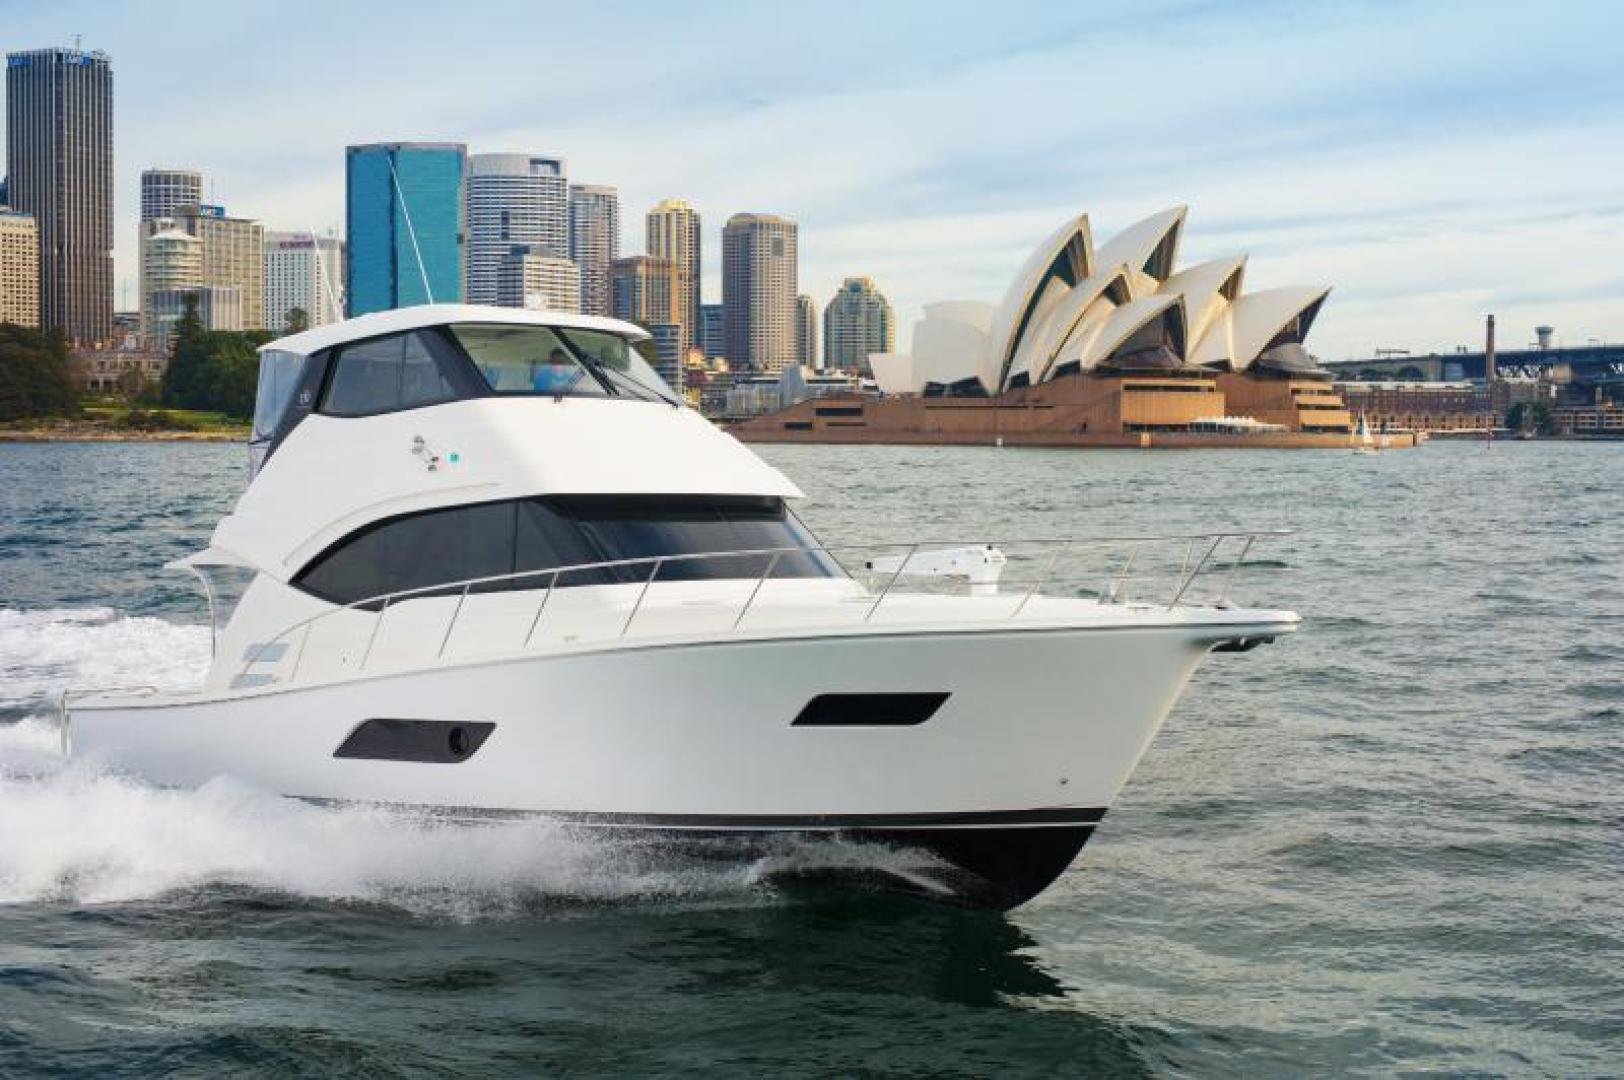 2019 Riviera 52' ENCLOSED FLYBRIDGE- ON ORDER!